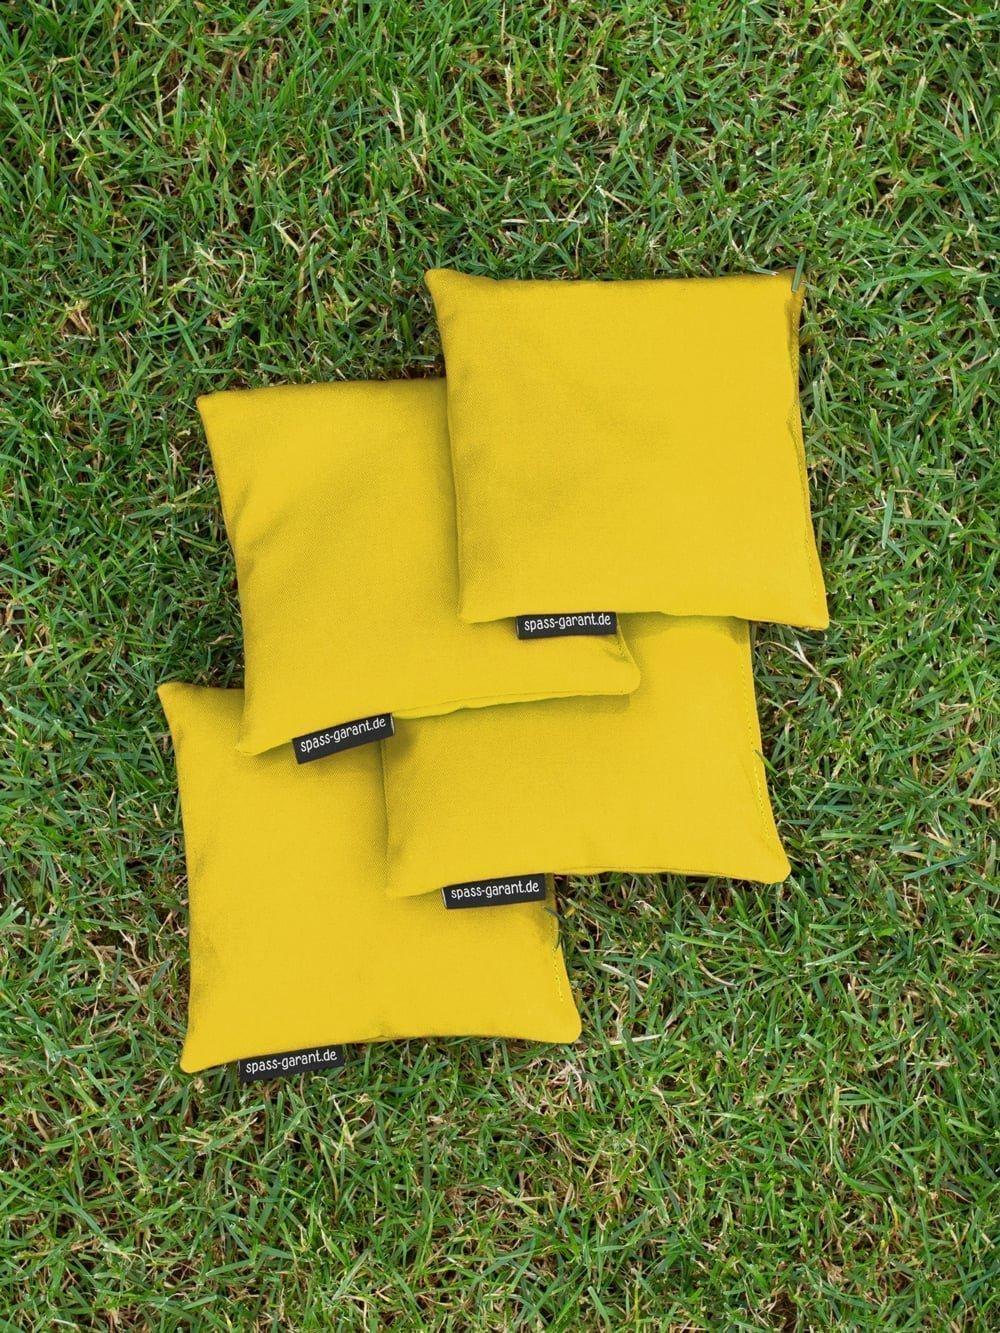 Top Qualit/ät made in Germany handgemacht Granulat oder Mais 4 Cornhole S/äckchen gelb 15 x 15 cm 400g